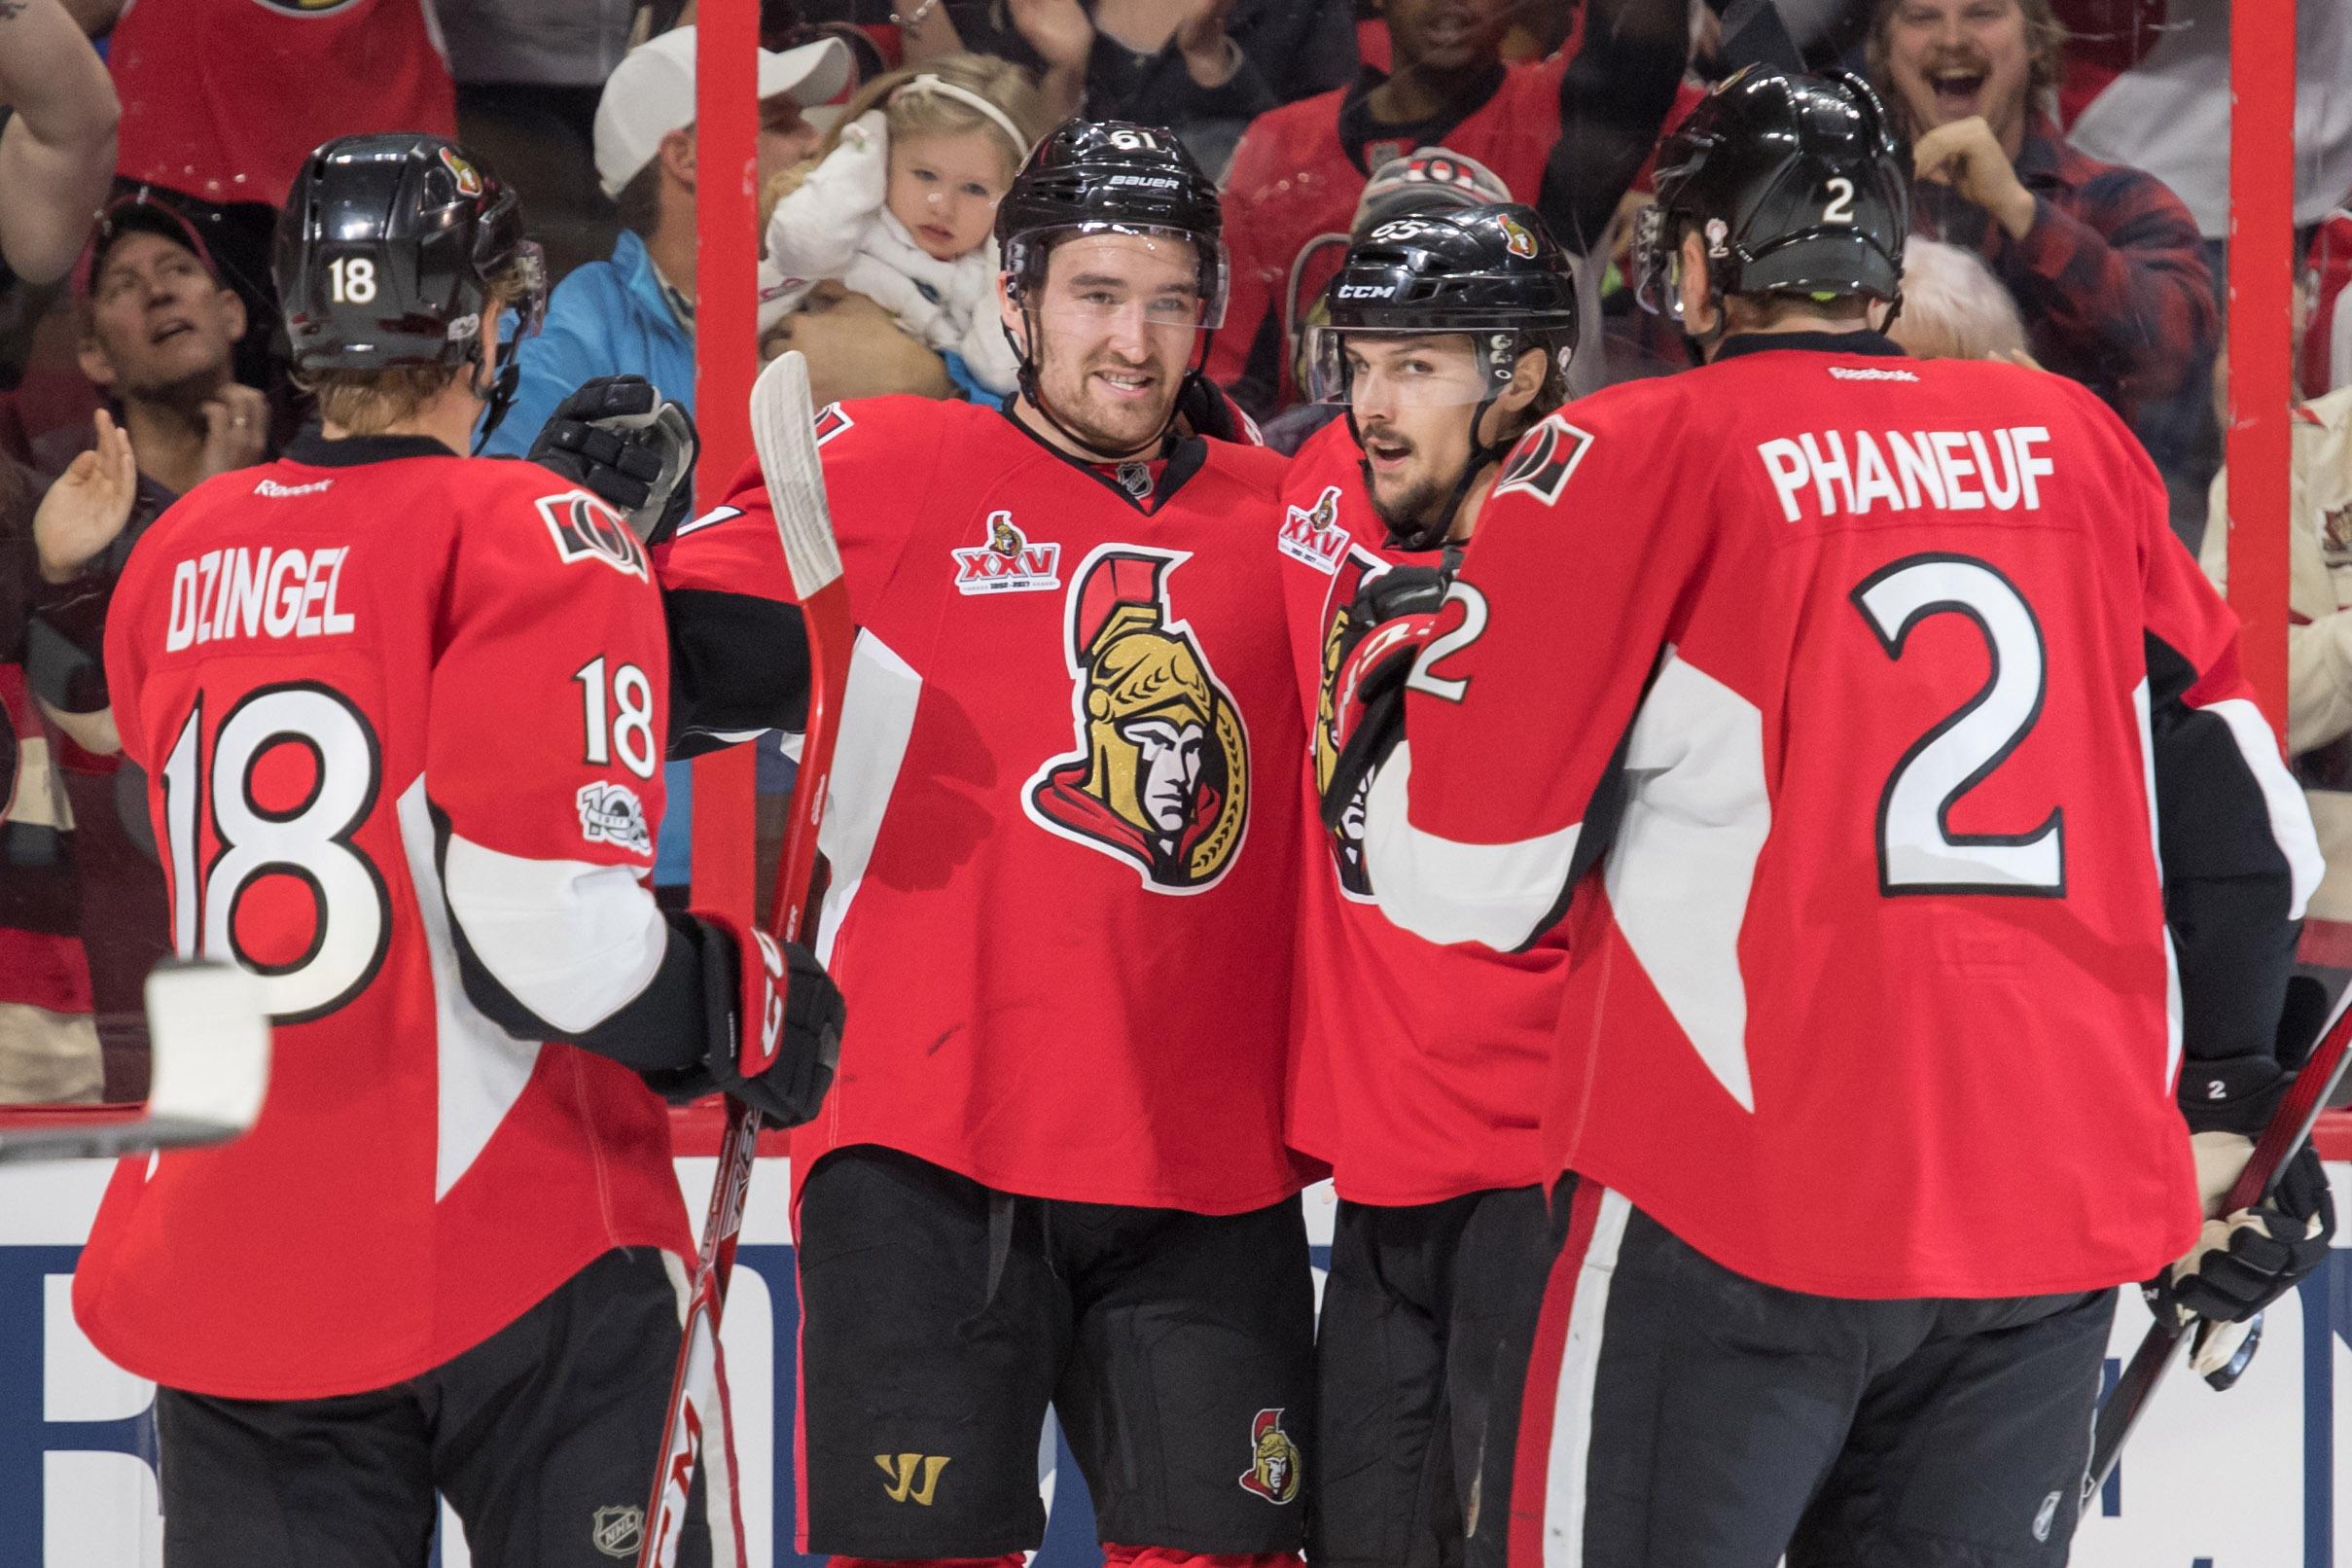 Ottawa Senators: Tough Four Game Road Trip Ahead